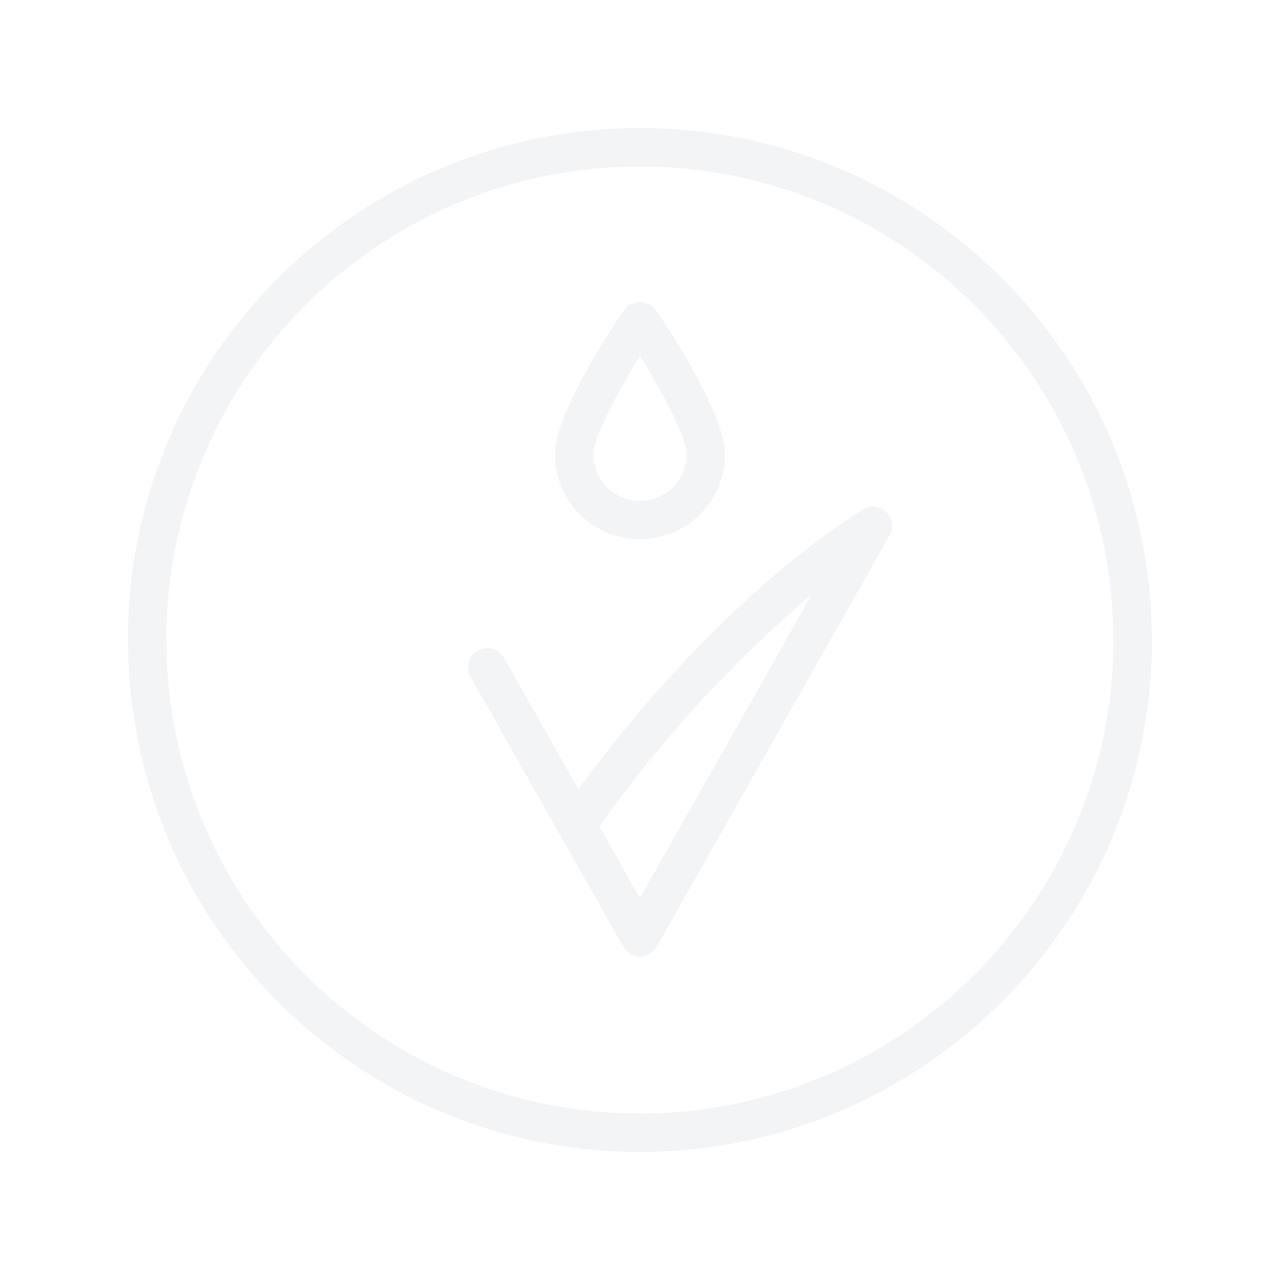 Everyday Minerals Luminous Blush Good Morning 4.8g